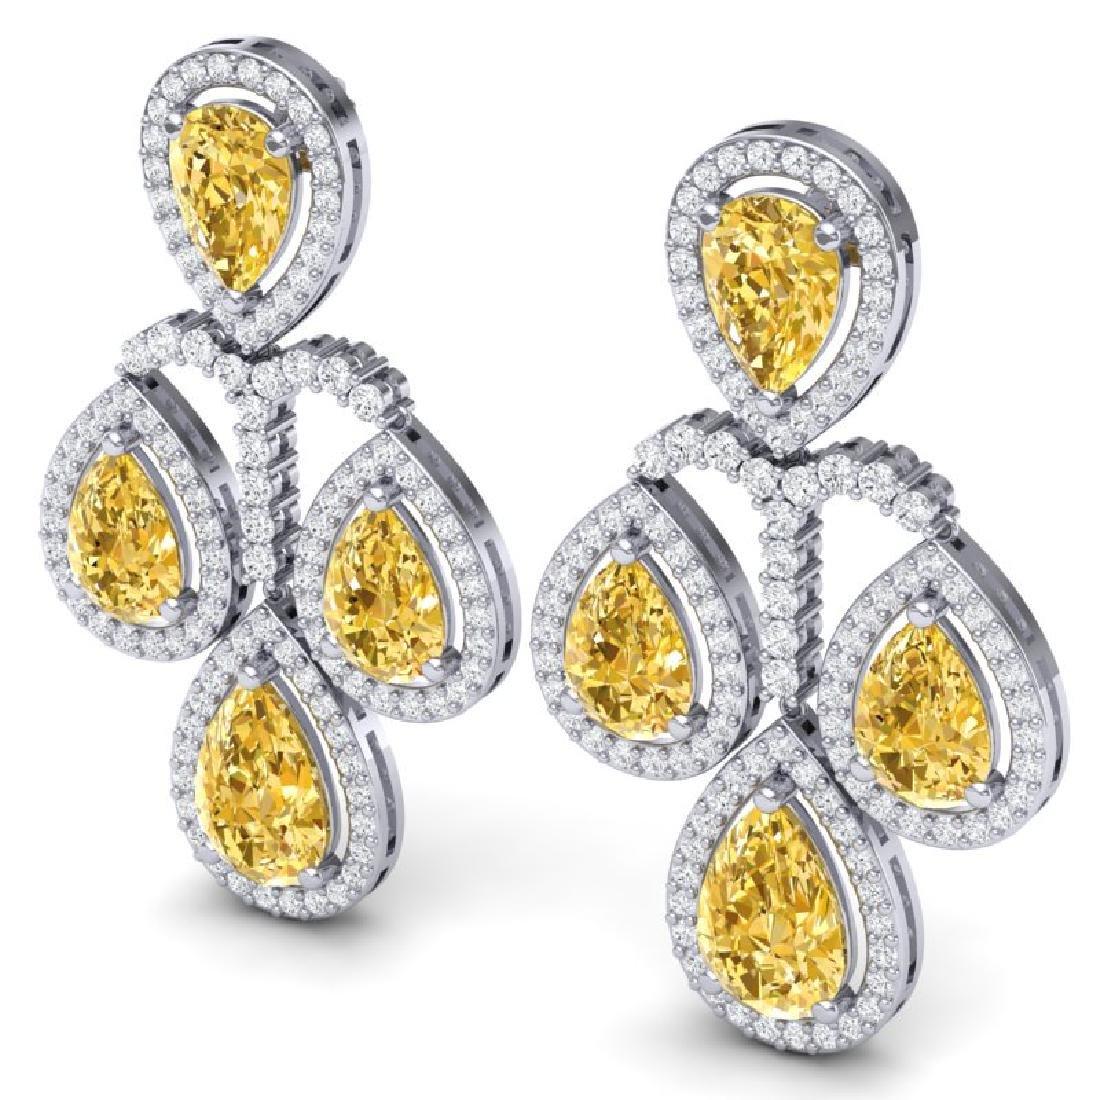 27.85 CTW Royalty Canary Citrine & VS Diamond Earrings - 2